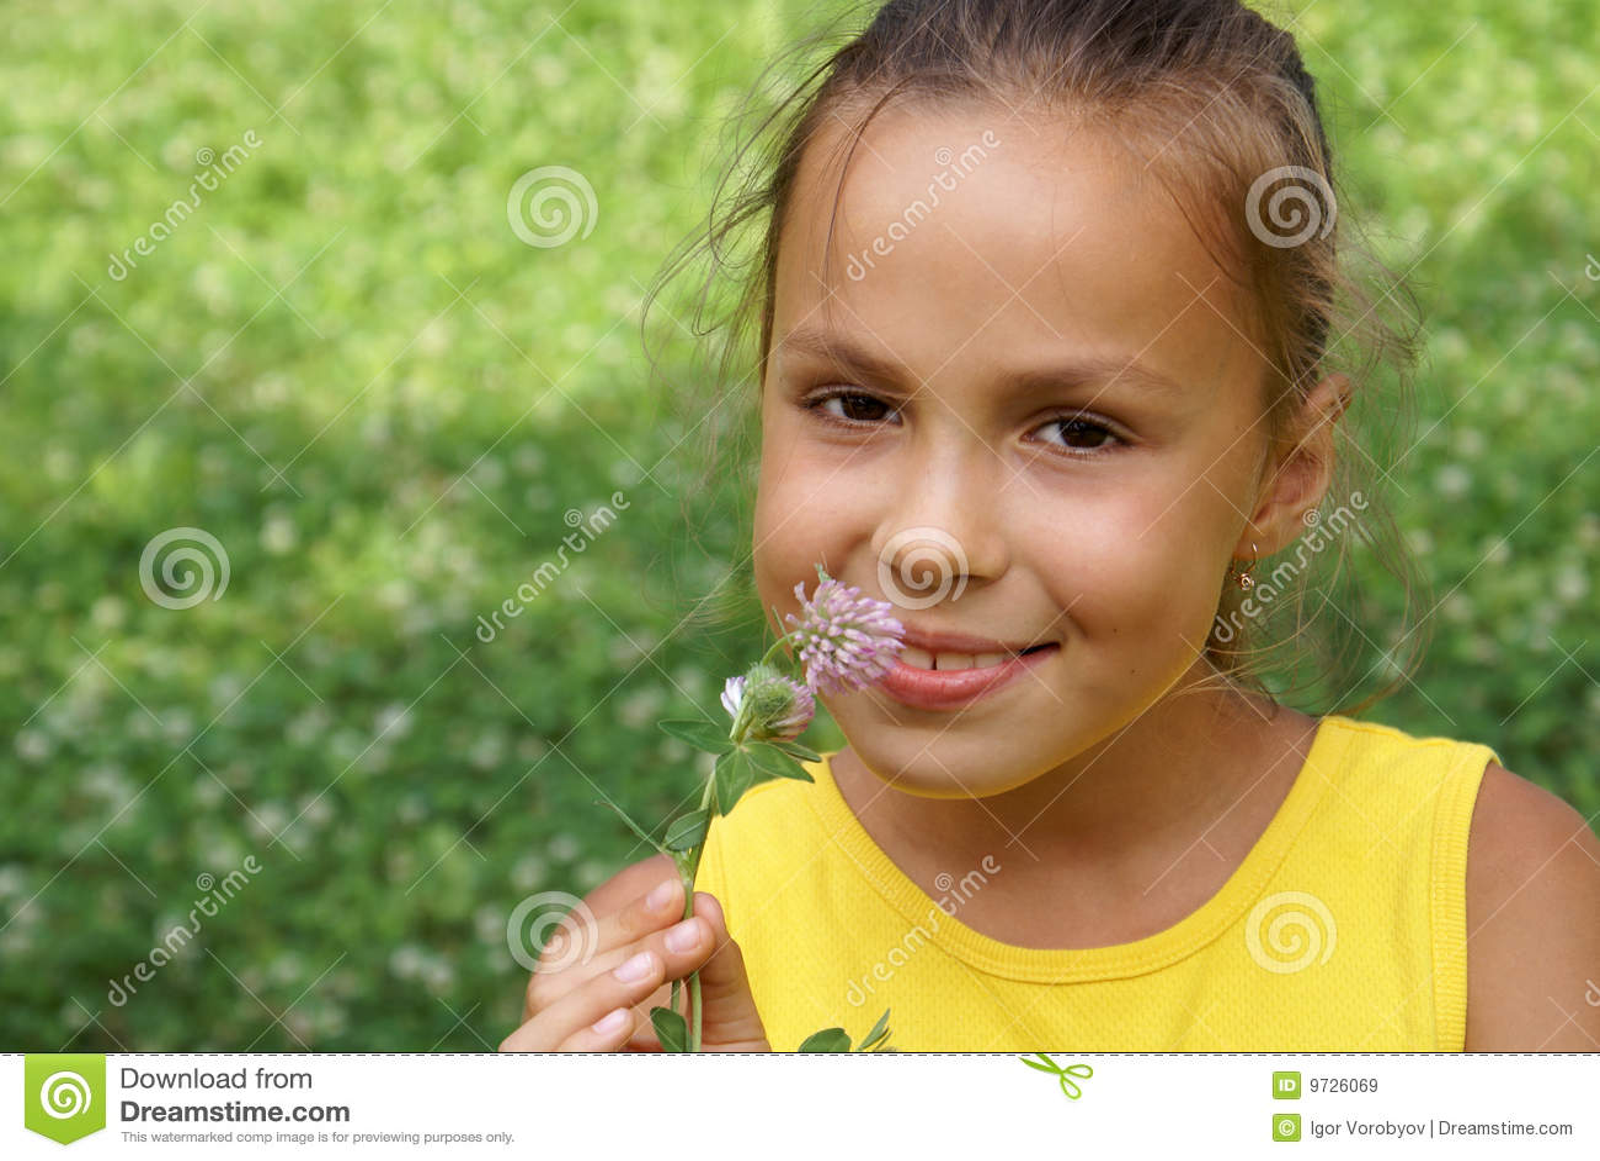 vk girl royalty free stock photo portrait of the little